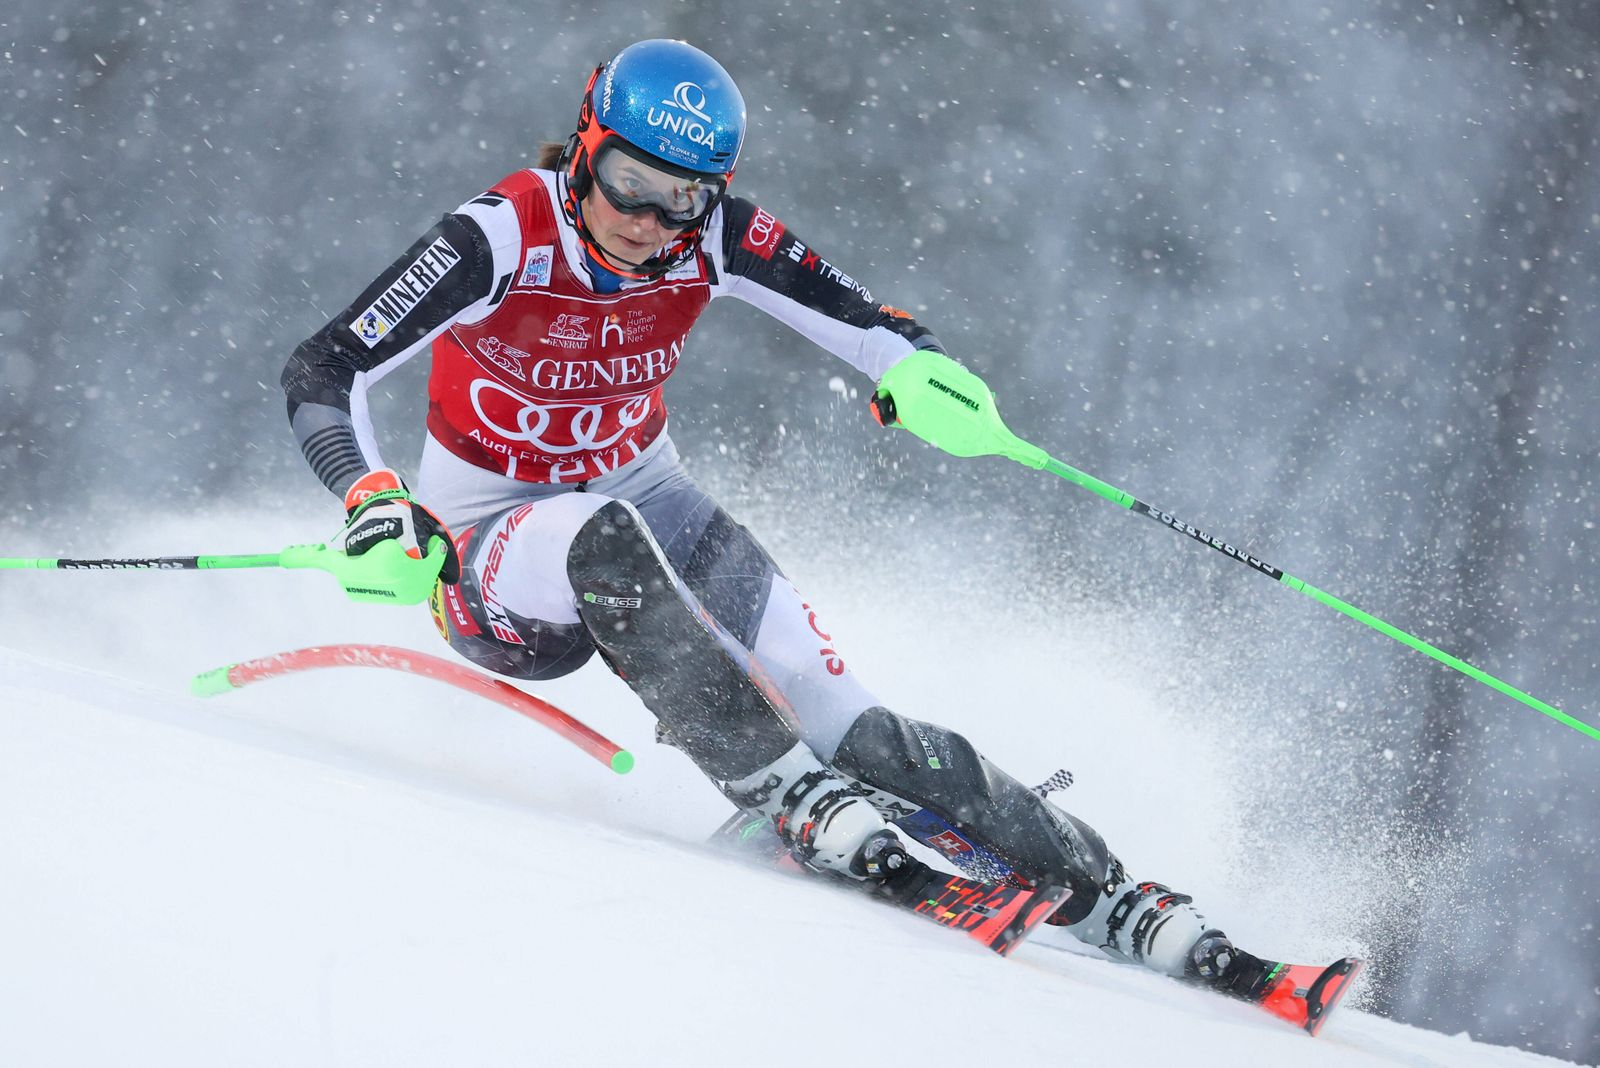 ALPINE SKIING - FIS WC Levi LEVI,FINLAND,22.NOV.20 - ALPINE SKIING - FIS World Cup, slalom, ladies. Image shows Petra V